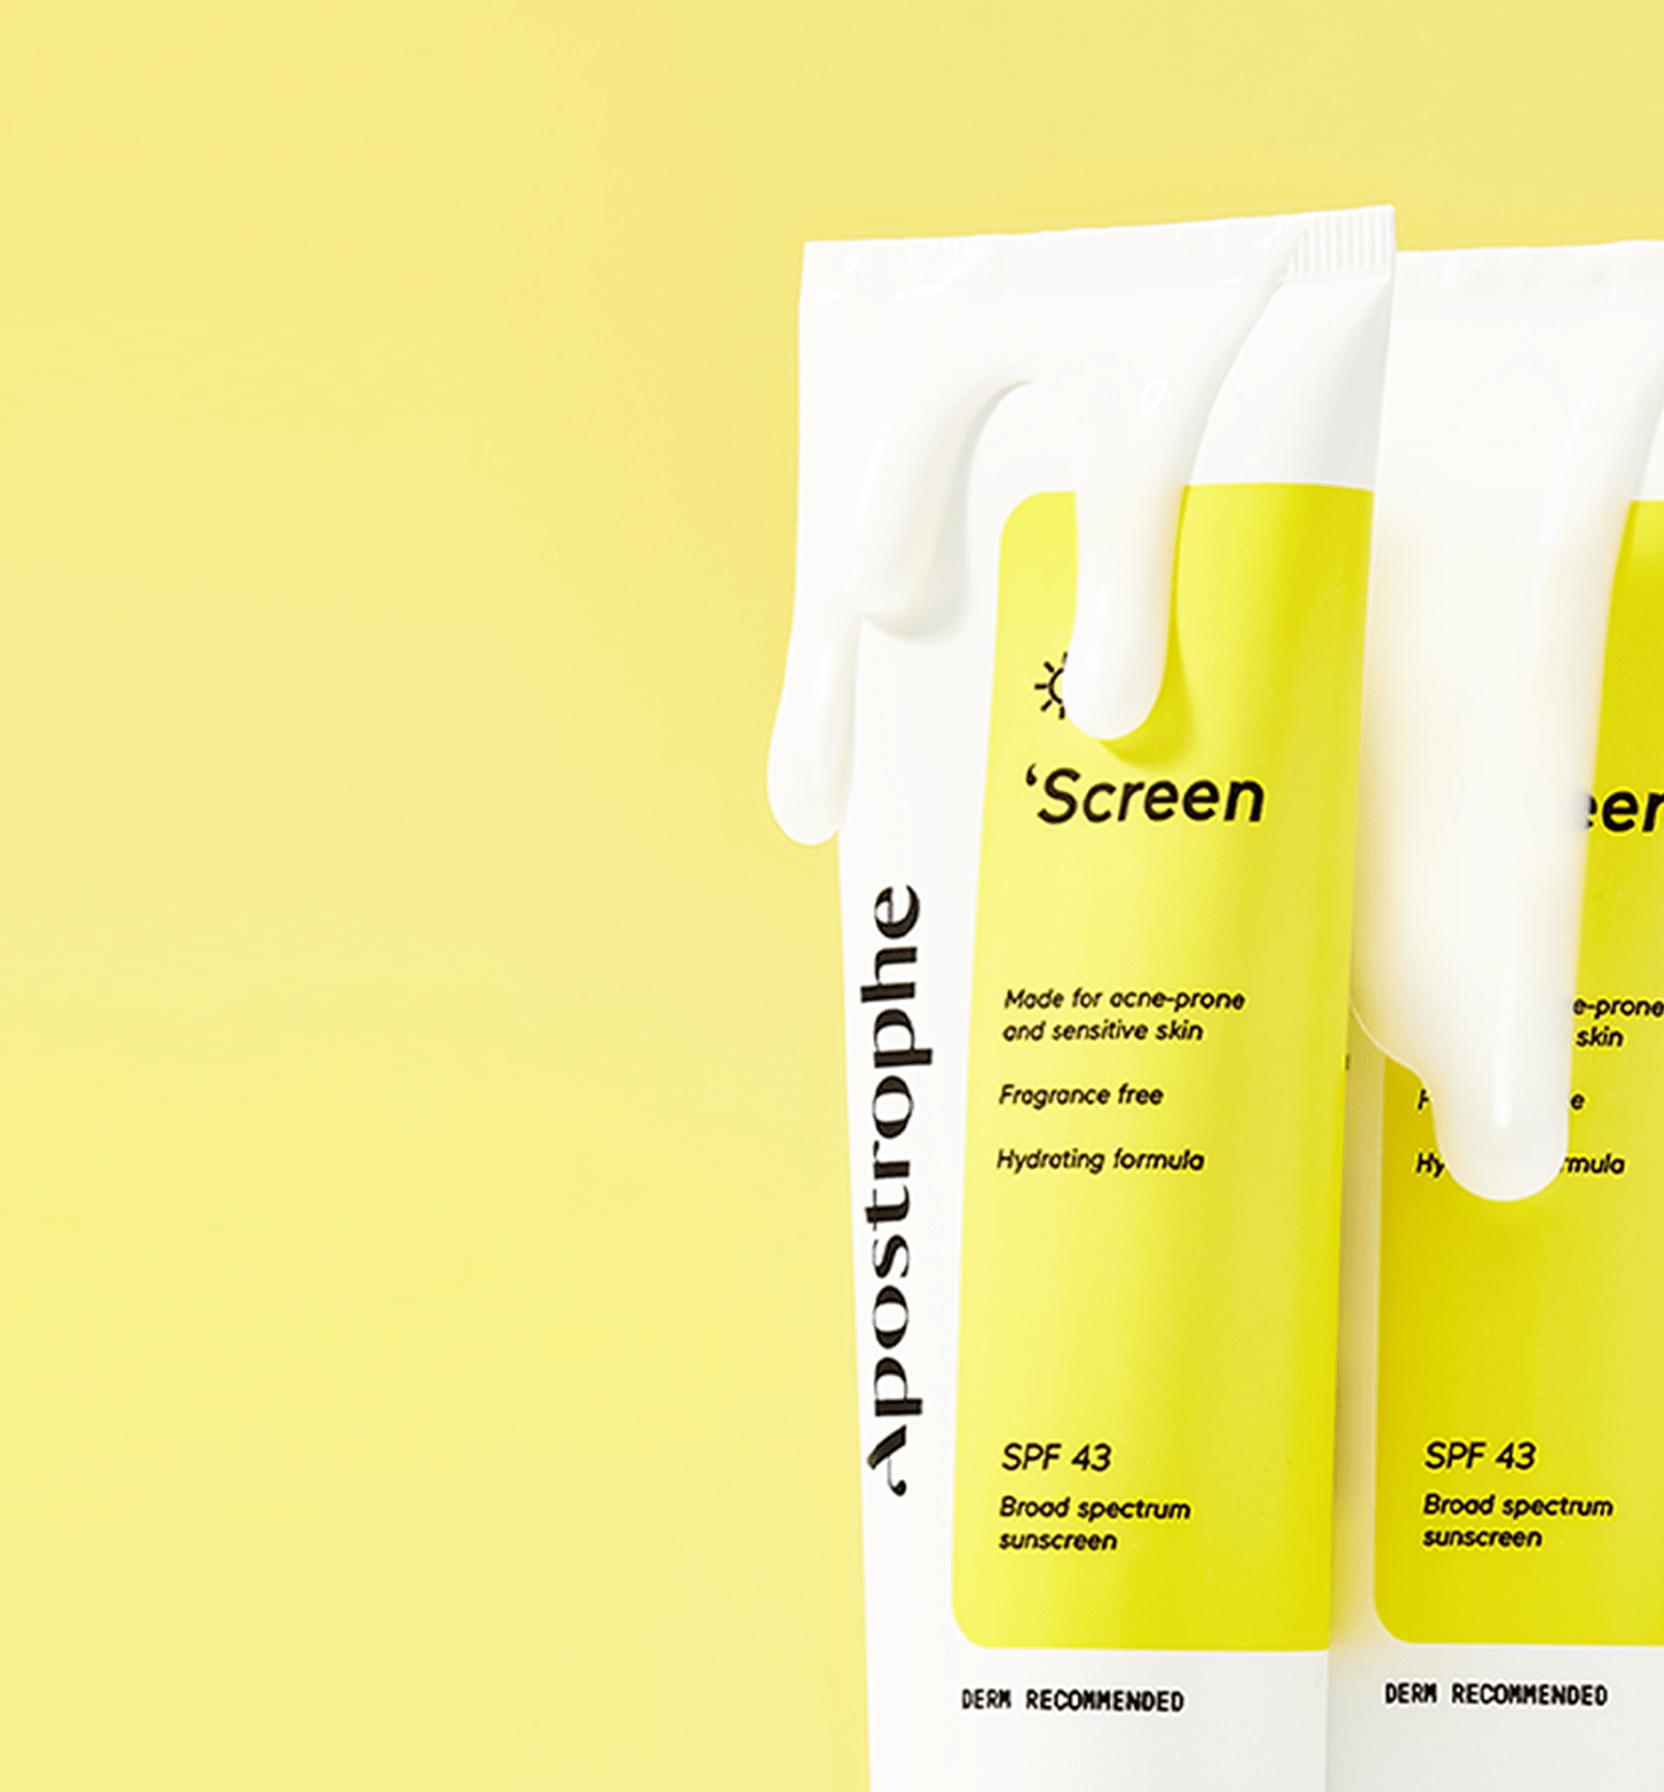 Apostrophe 'Screen sunscreen for sensitive and acne-prone skin